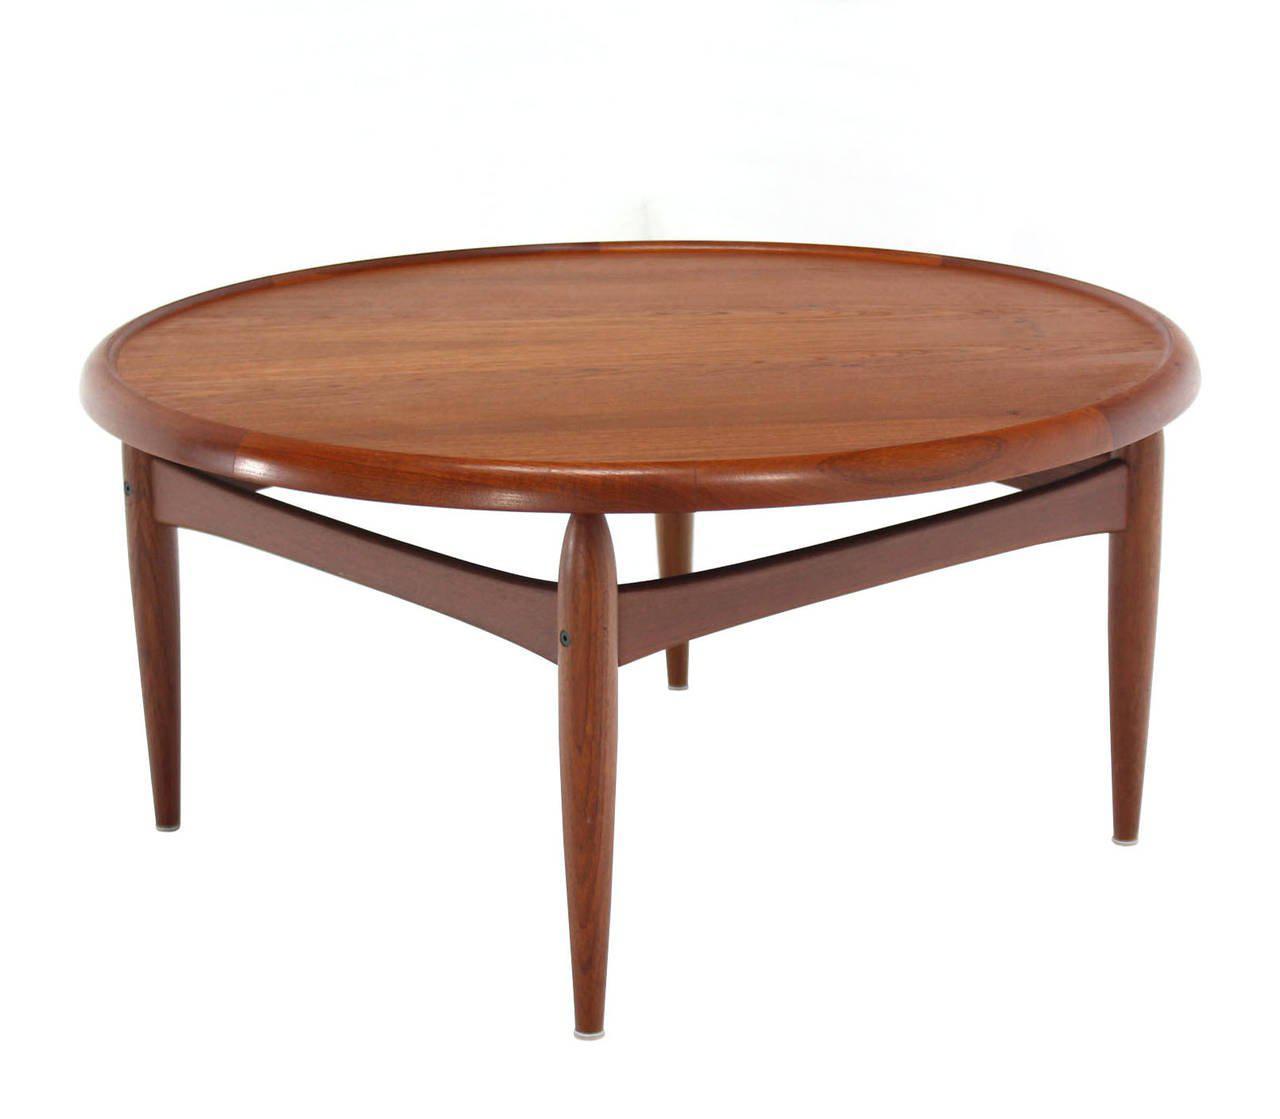 Amazing Reversible Flip Top Danish Modern Round Teak Coffee Table   Image 2 Of 9